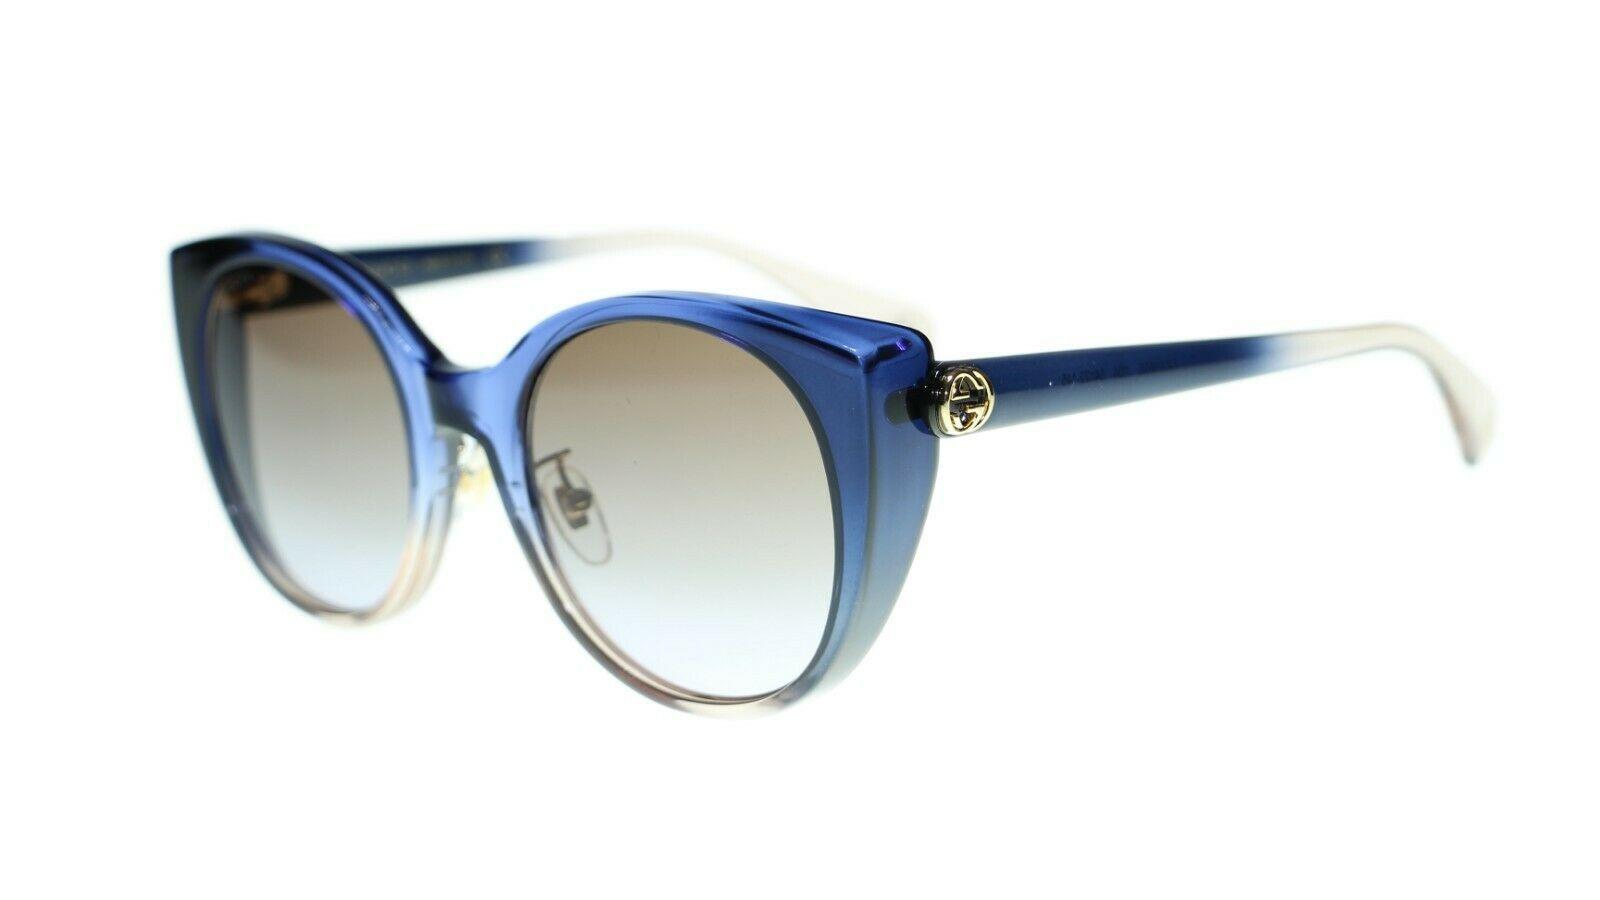 07915e28a NEW Gucci Women GG0369S Sunglasses Cat Eye Gradient Lenses Authentic